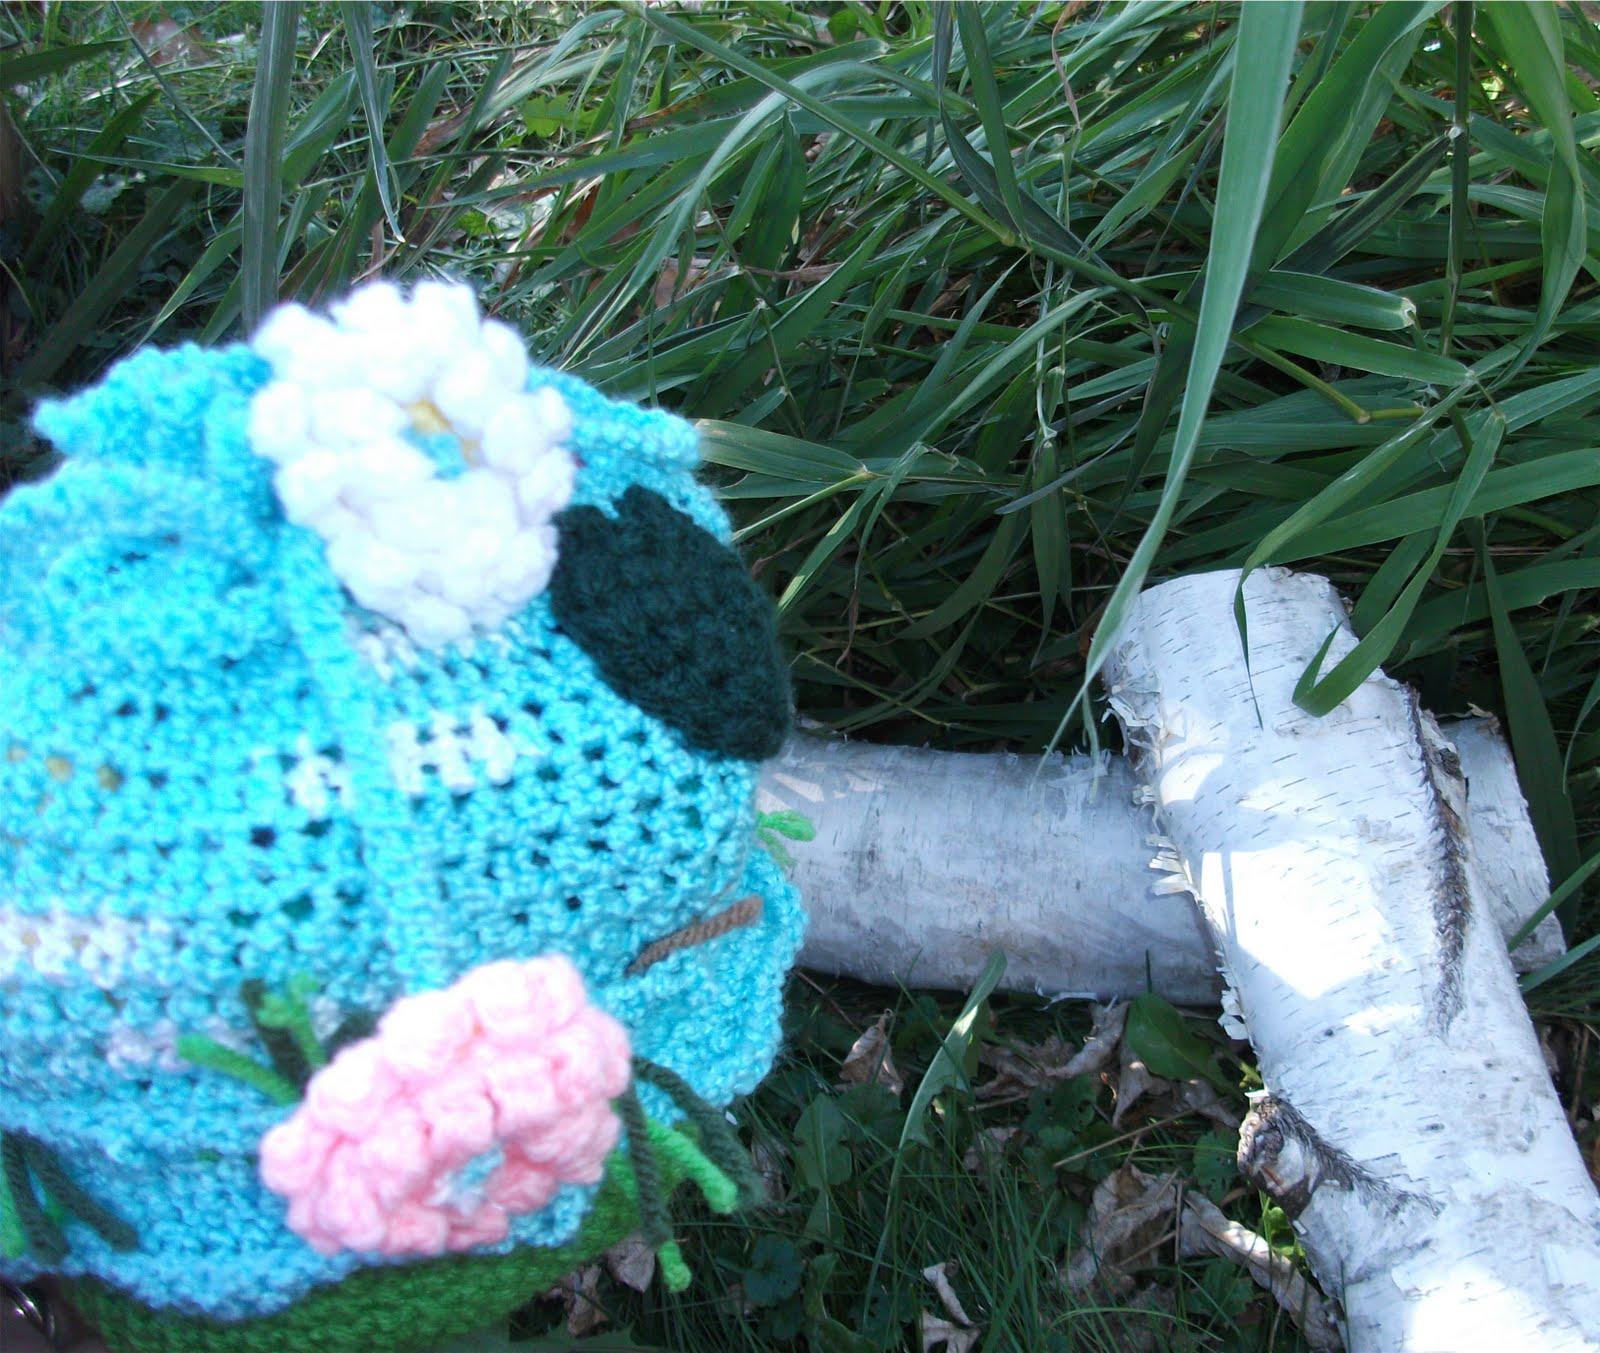 Bizzy Crochet: Frog Pond Pattern